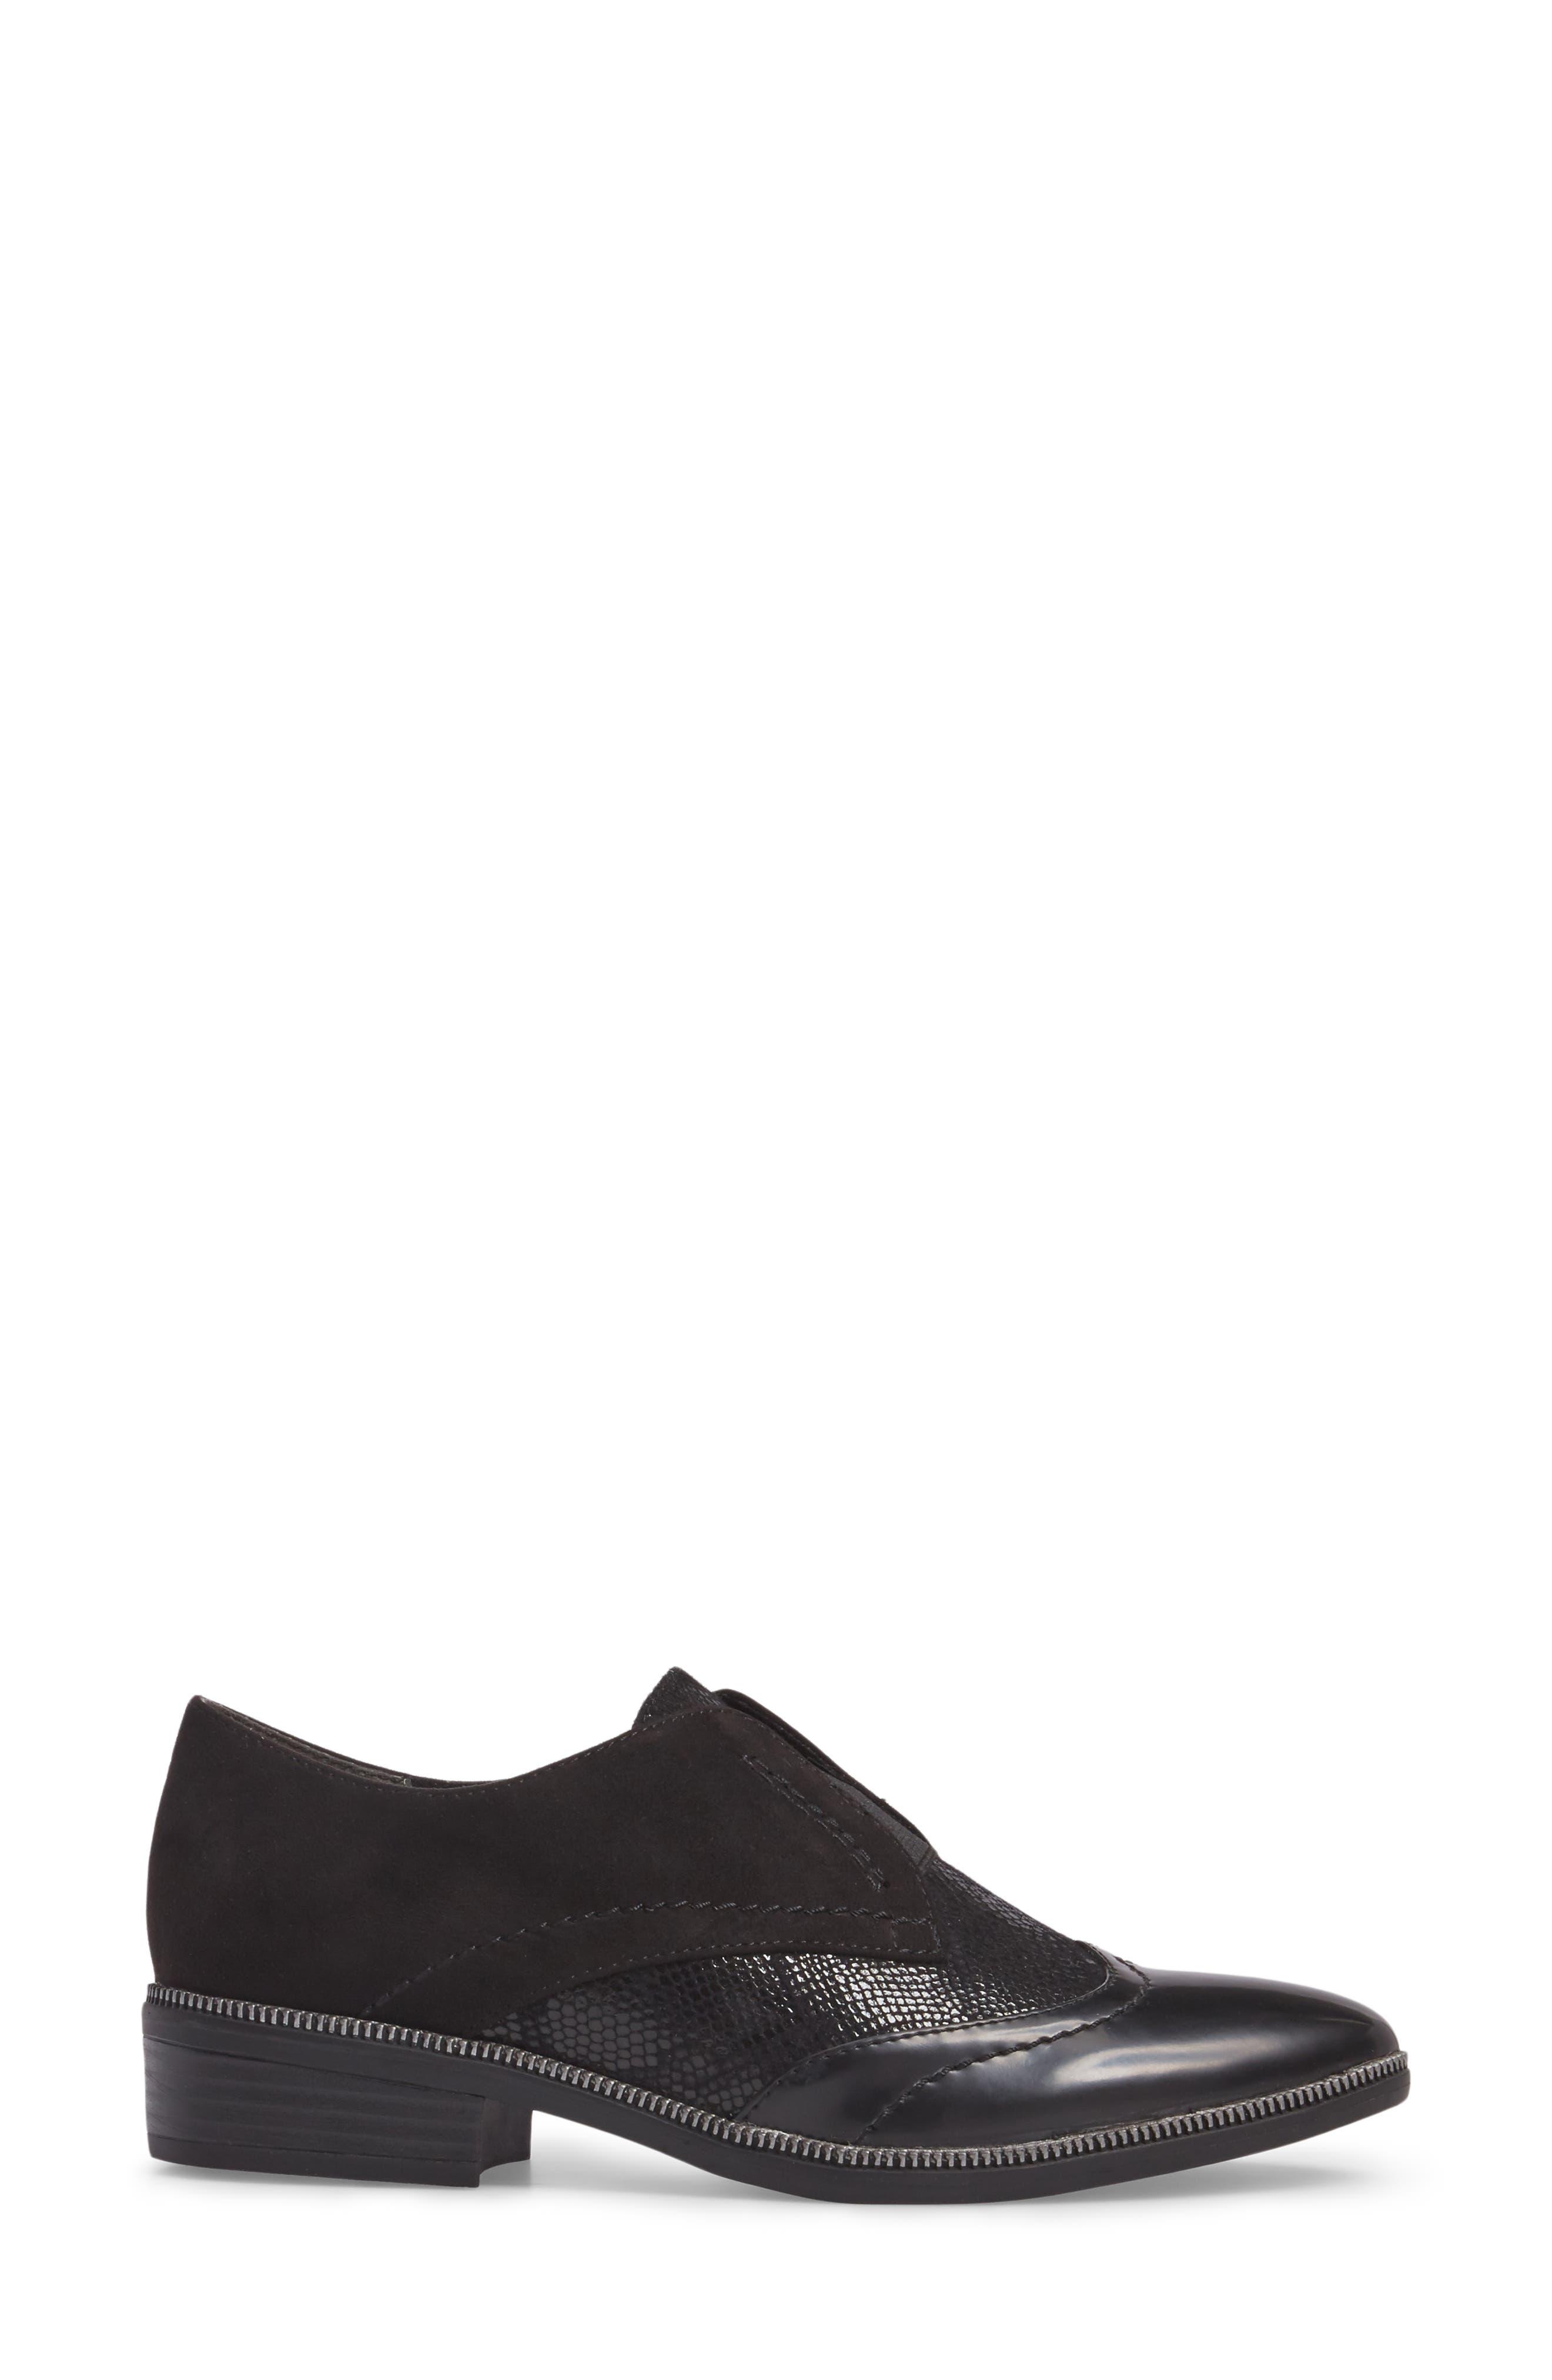 'Phanie' Slip-On Oxford,                             Alternate thumbnail 3, color,                             Black Fabric